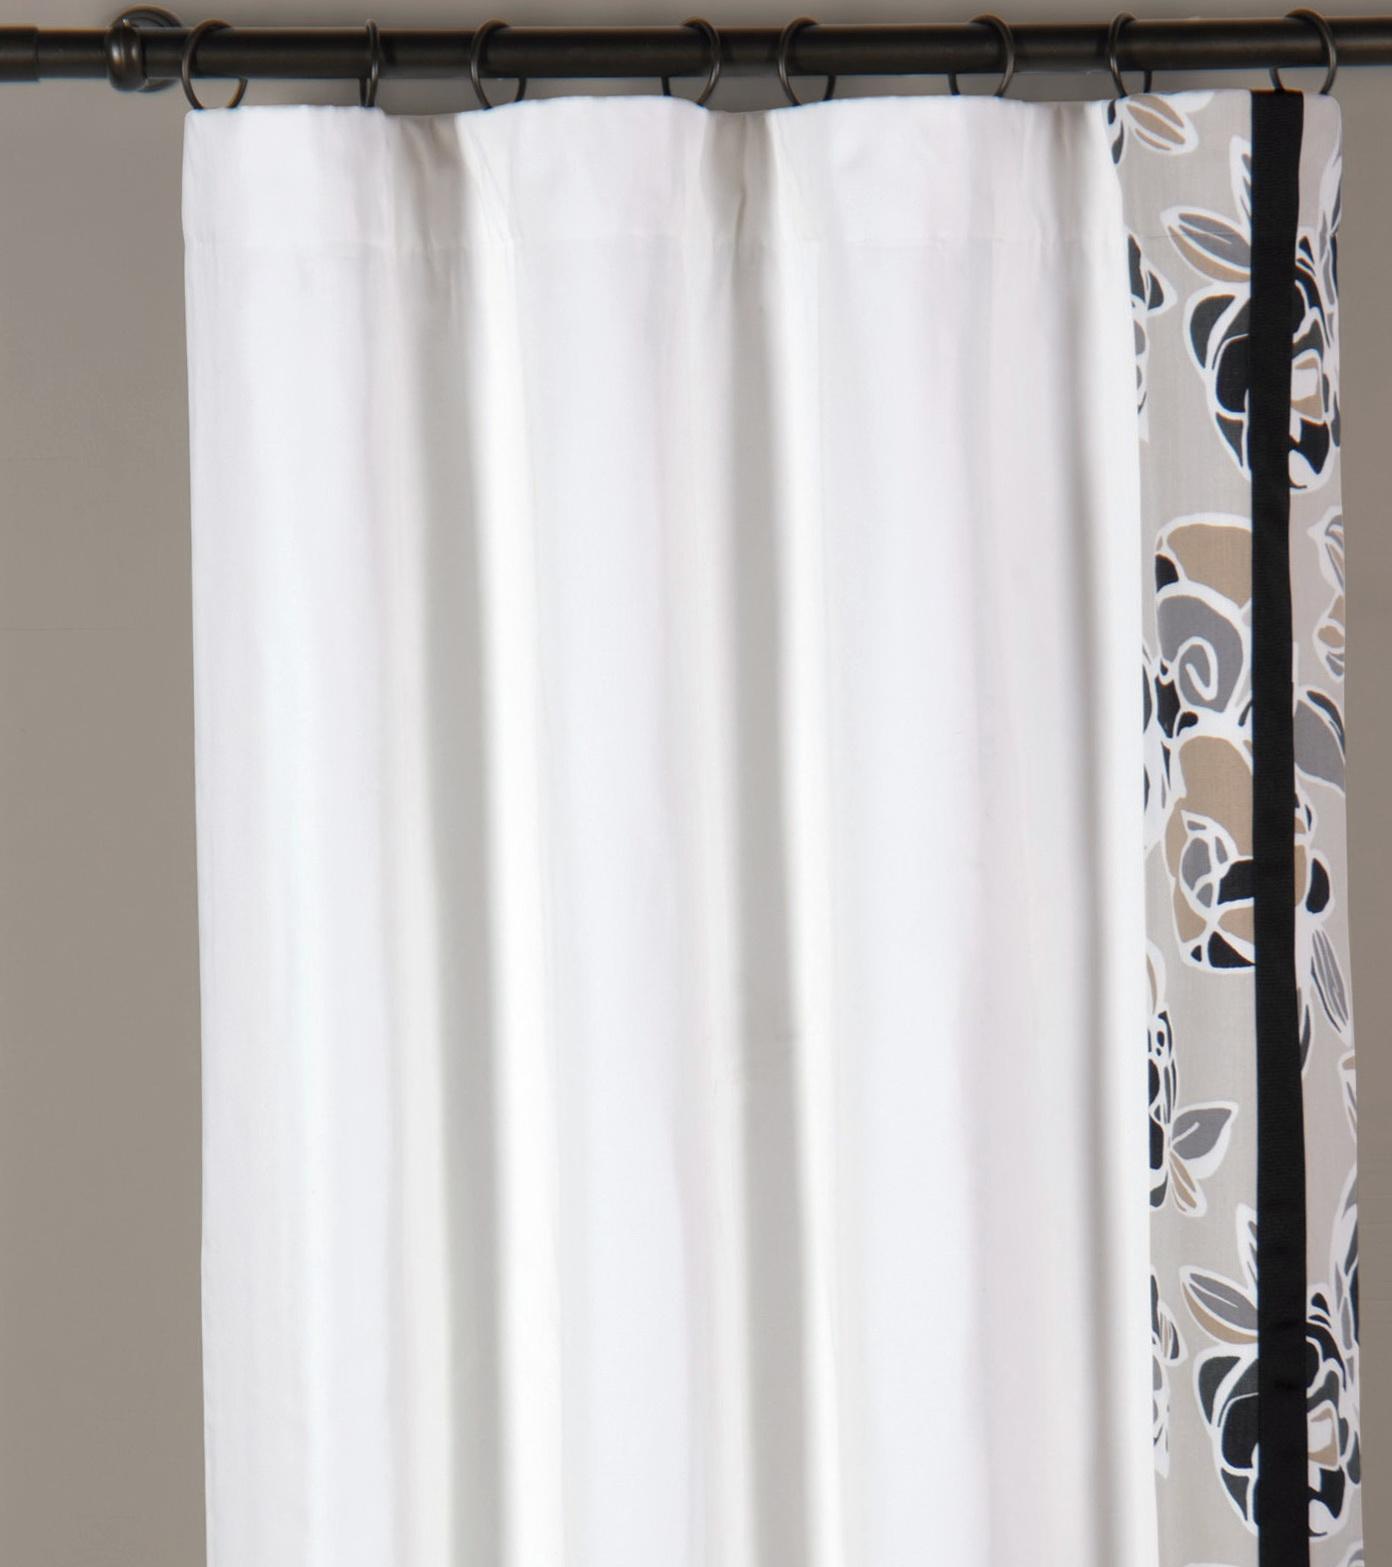 White Cafe Curtains Amazon